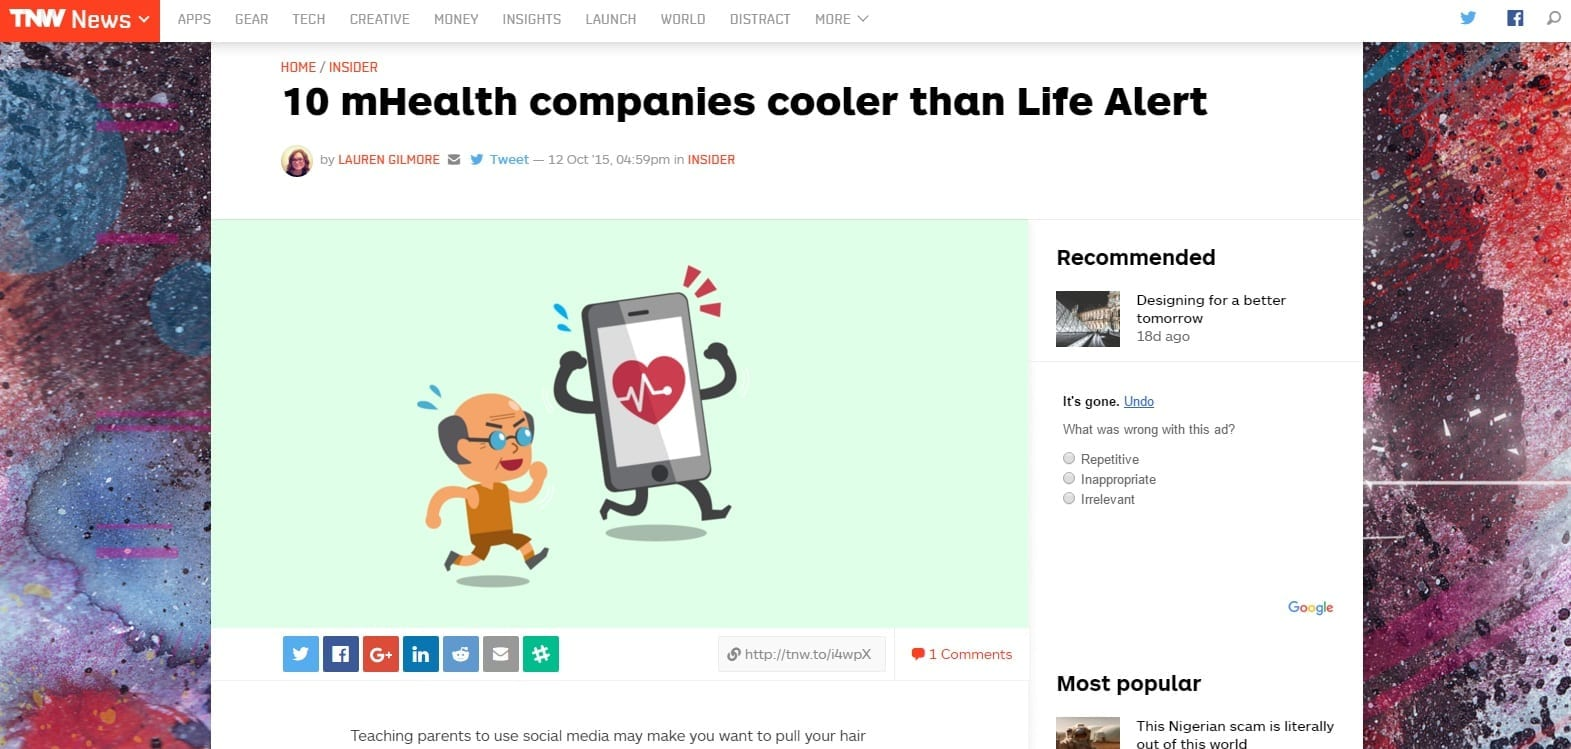 TheNextWeb News - Cooler Than LifeAlert